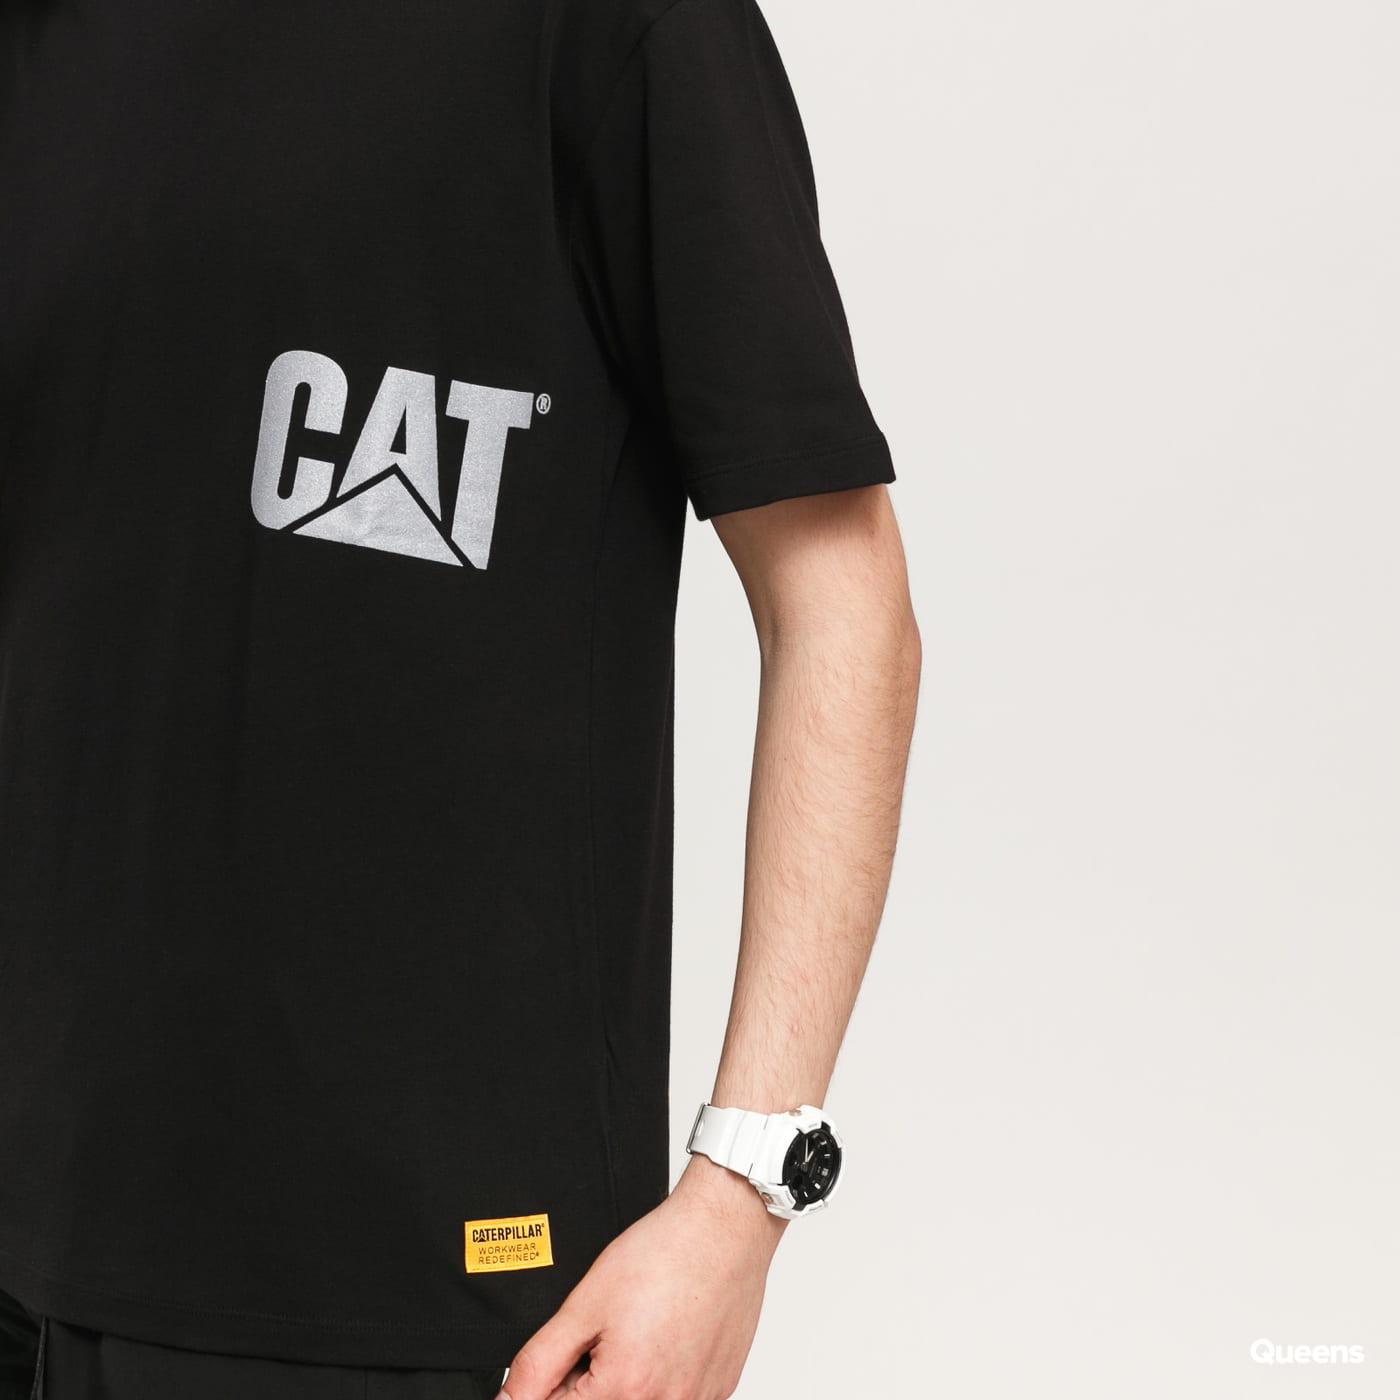 CATERPILLAR CAT Reflective Logo černé